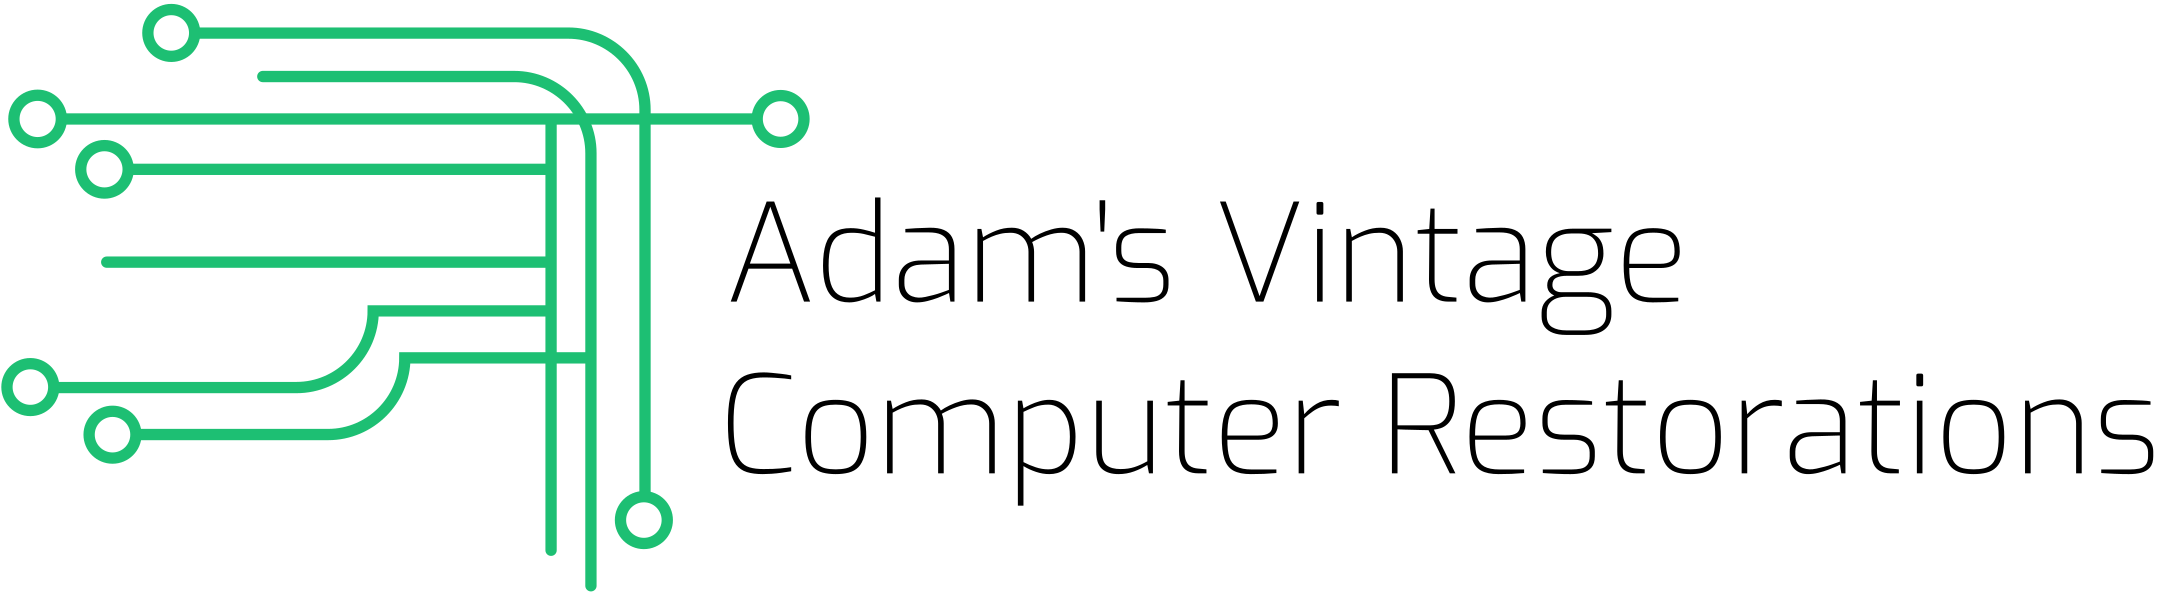 Adam's Vintage Computer Restorations